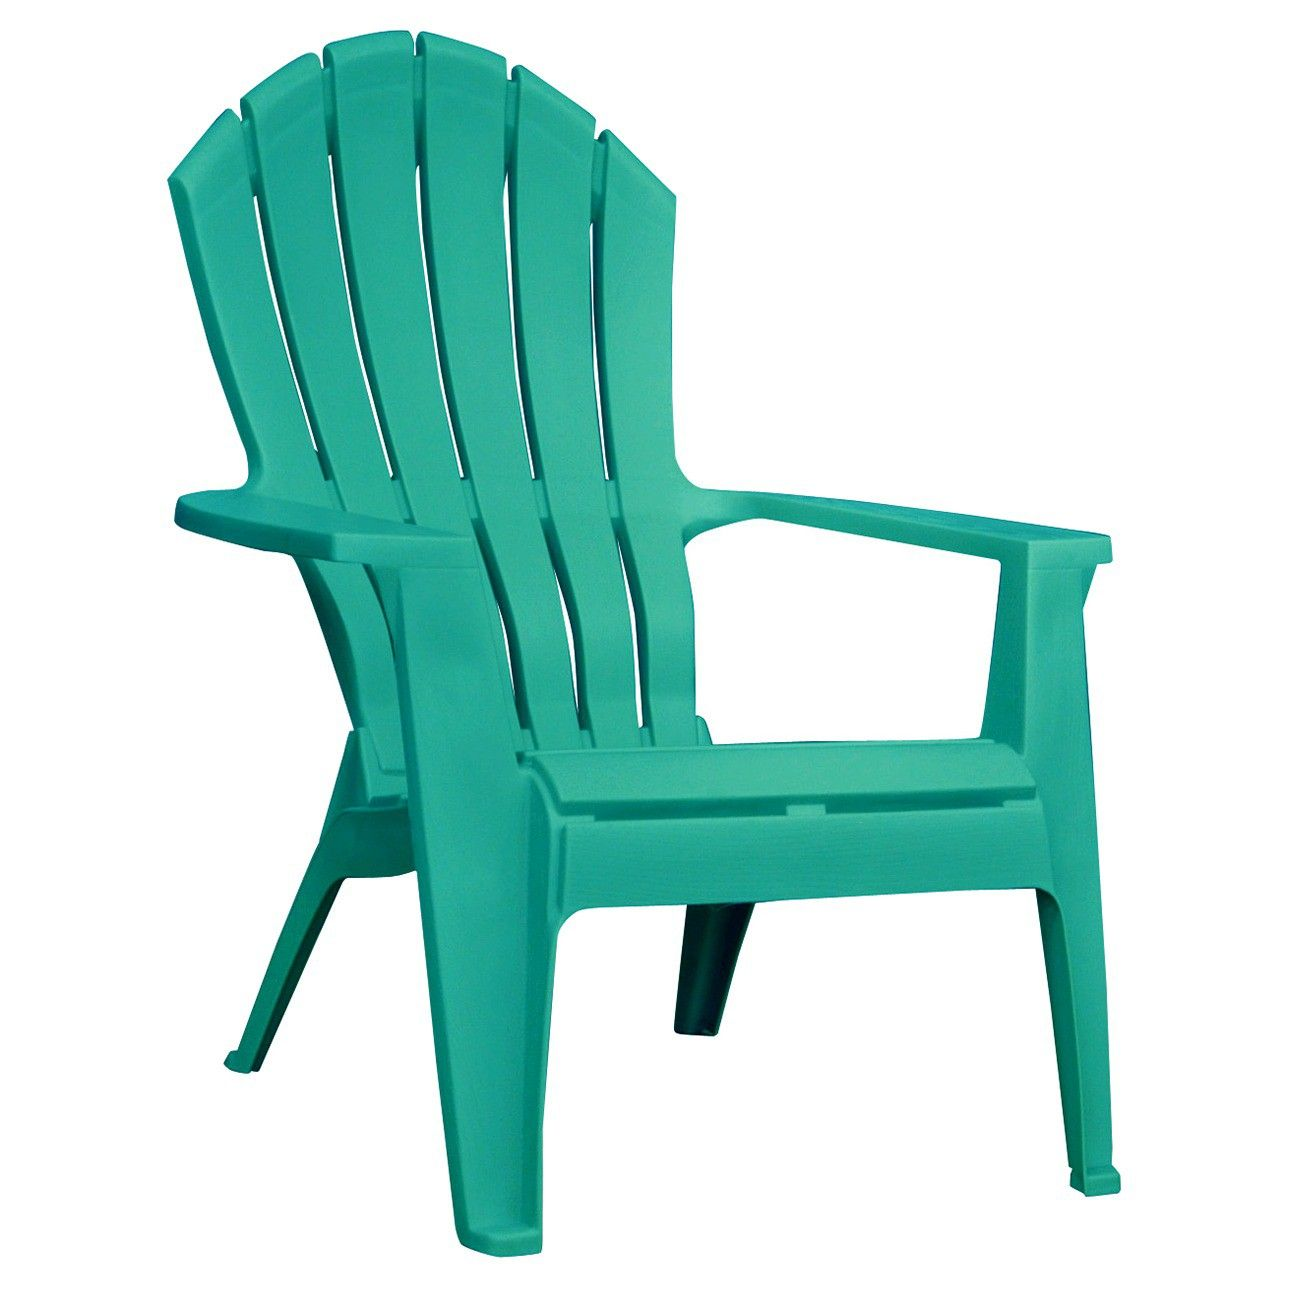 Resin Adirondack Chair Turquoise